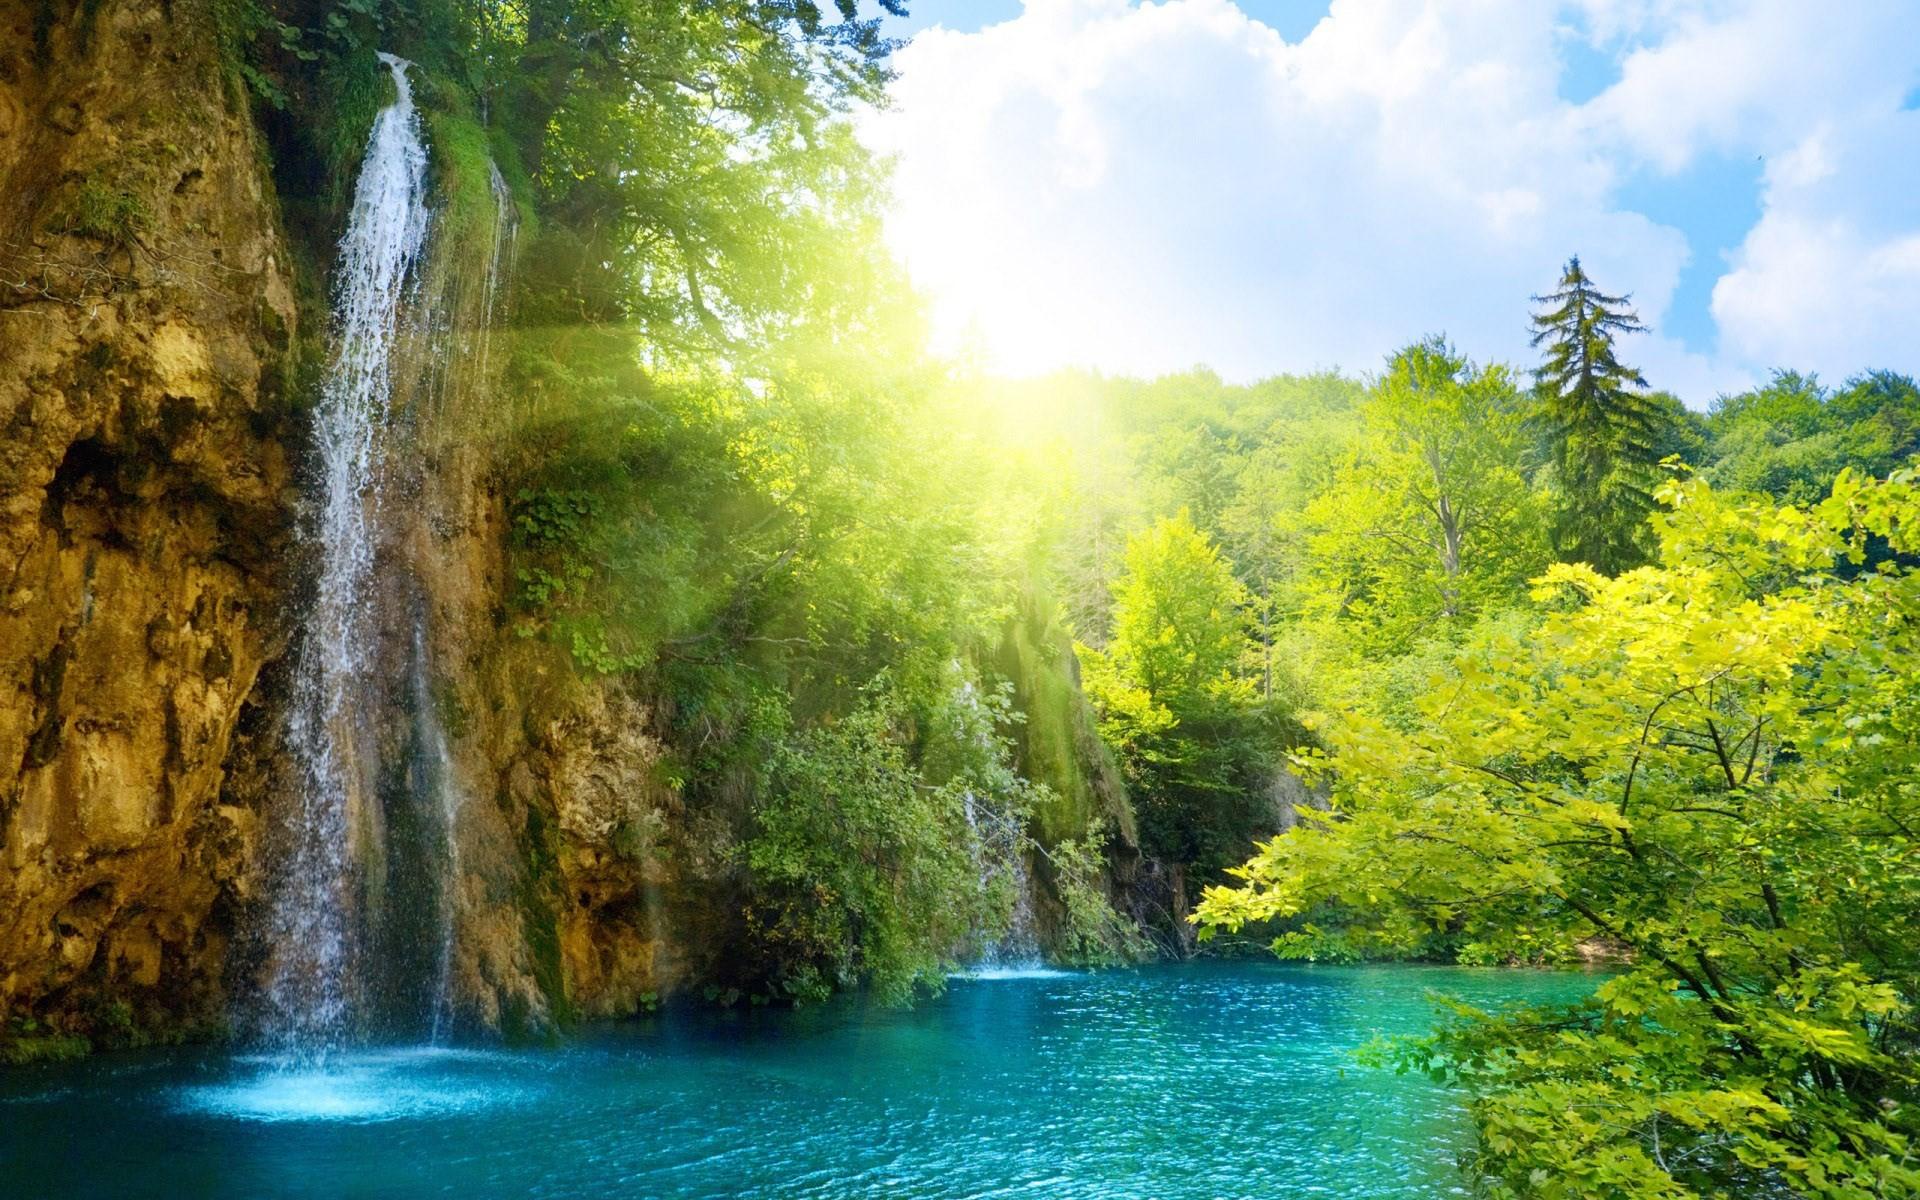 waterfall free computer wallpaper